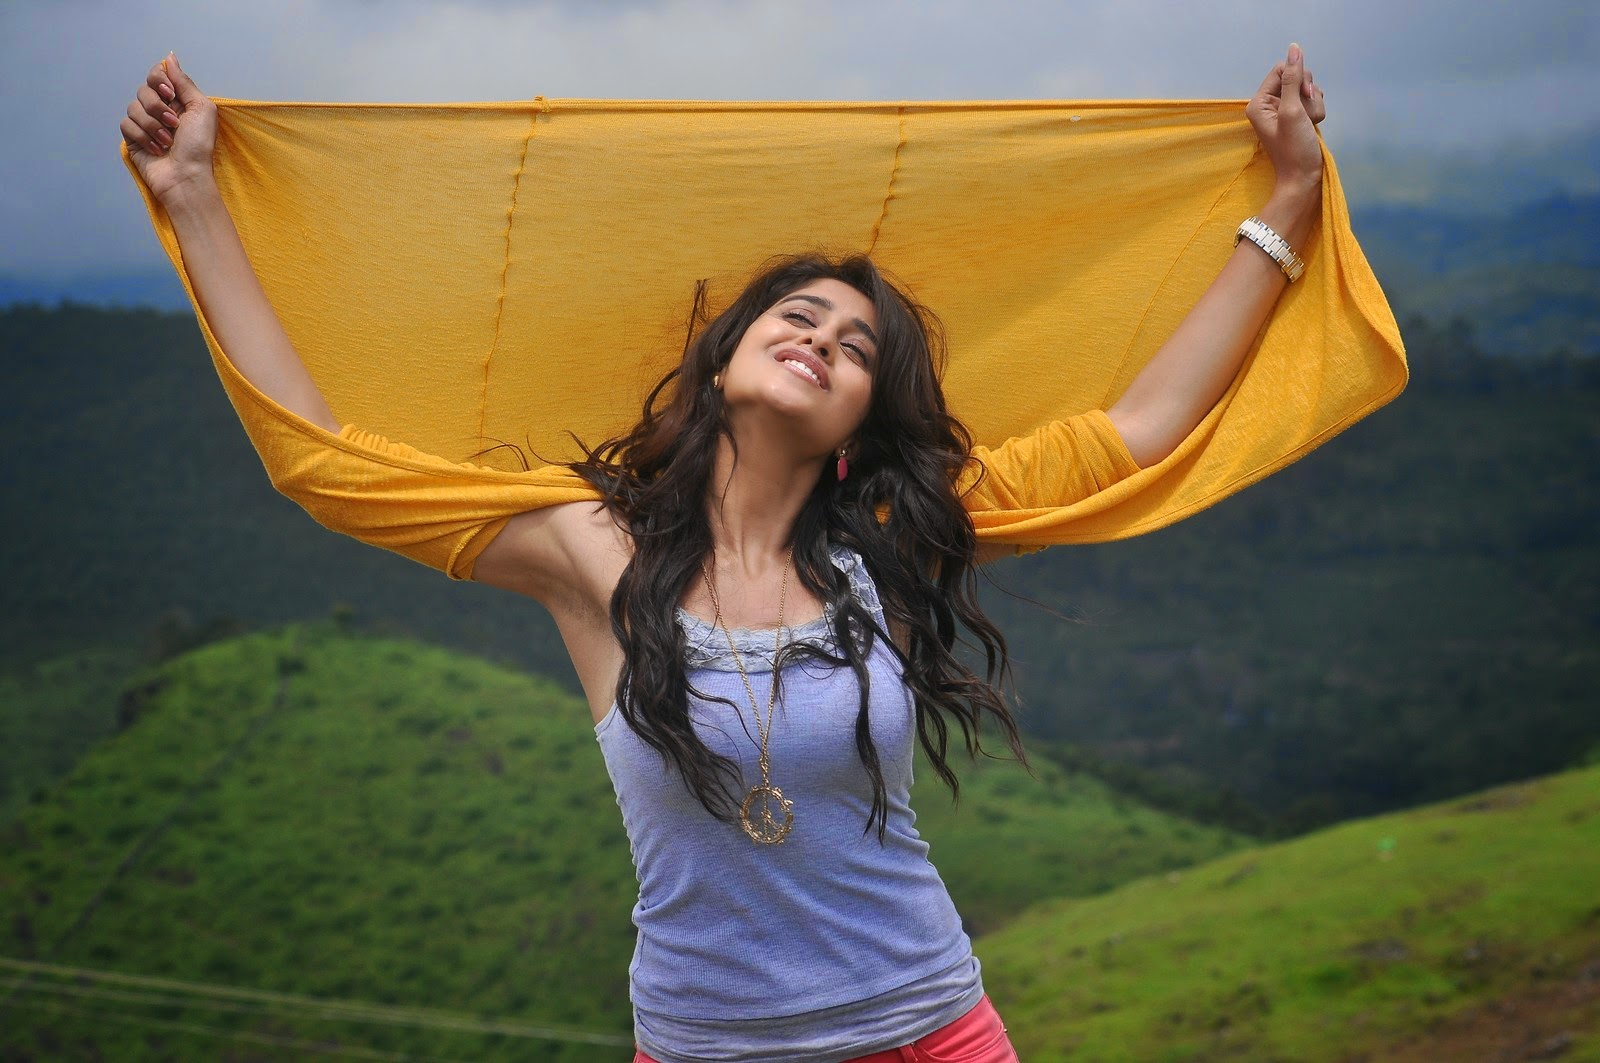 LG moviee: Ra Ra Krishnayya Telugu Movie Stills